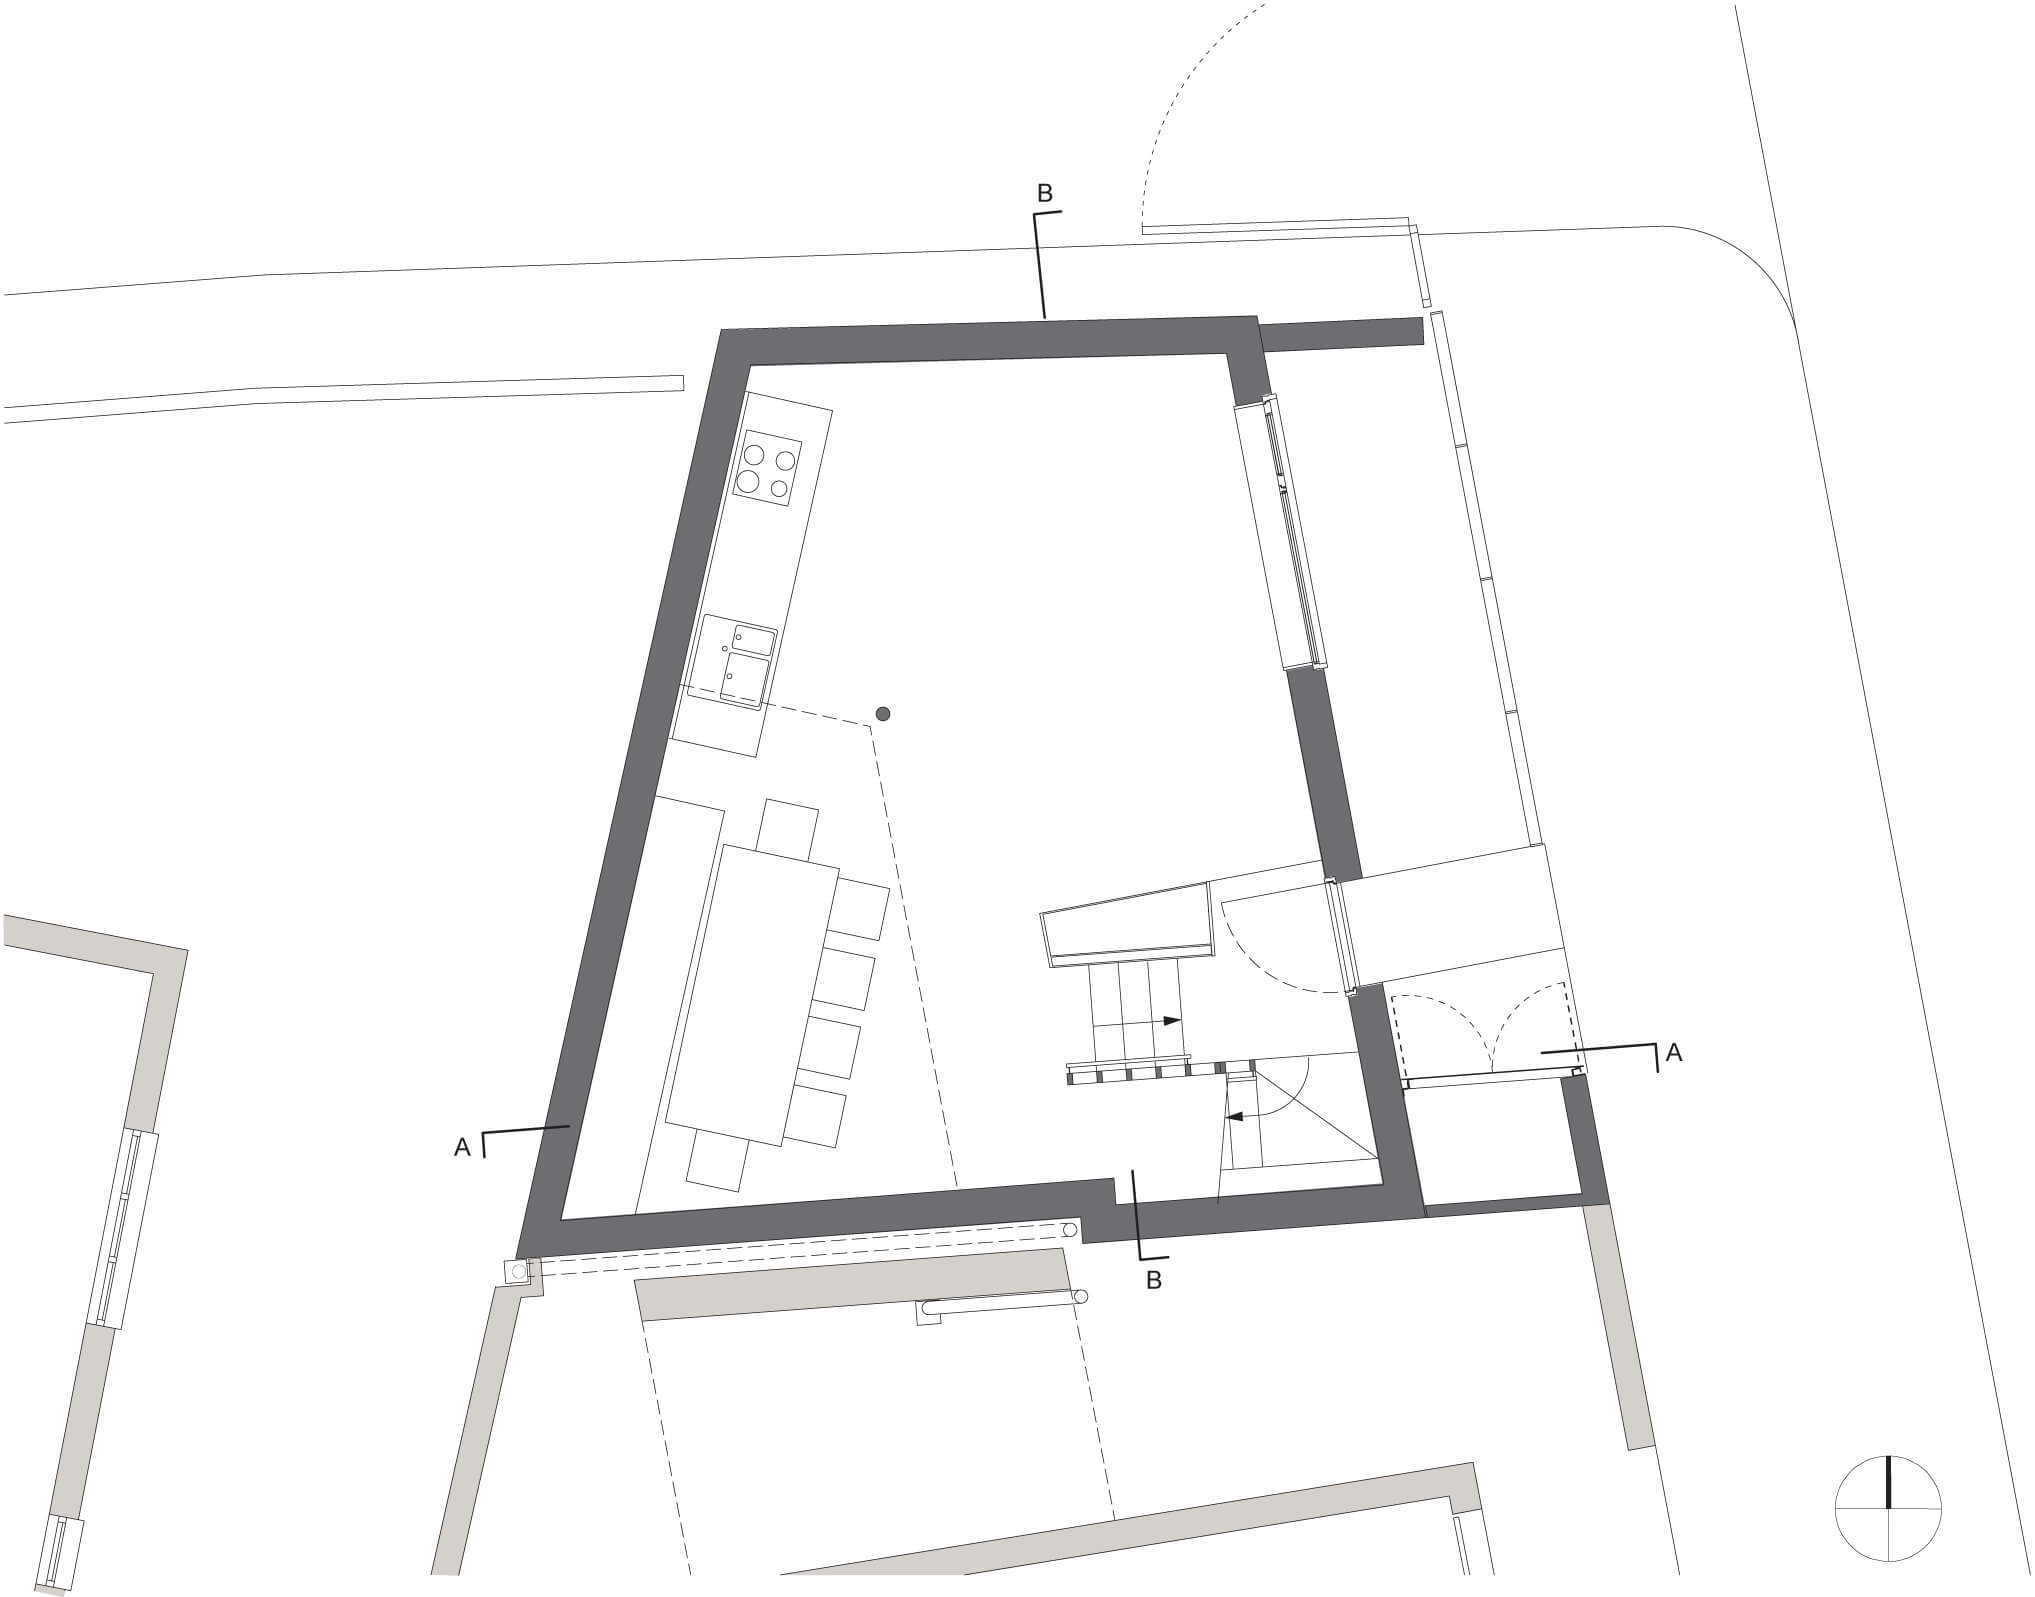 Newington Green House 13 - RGB - Prewett Bizley Architects.jpg